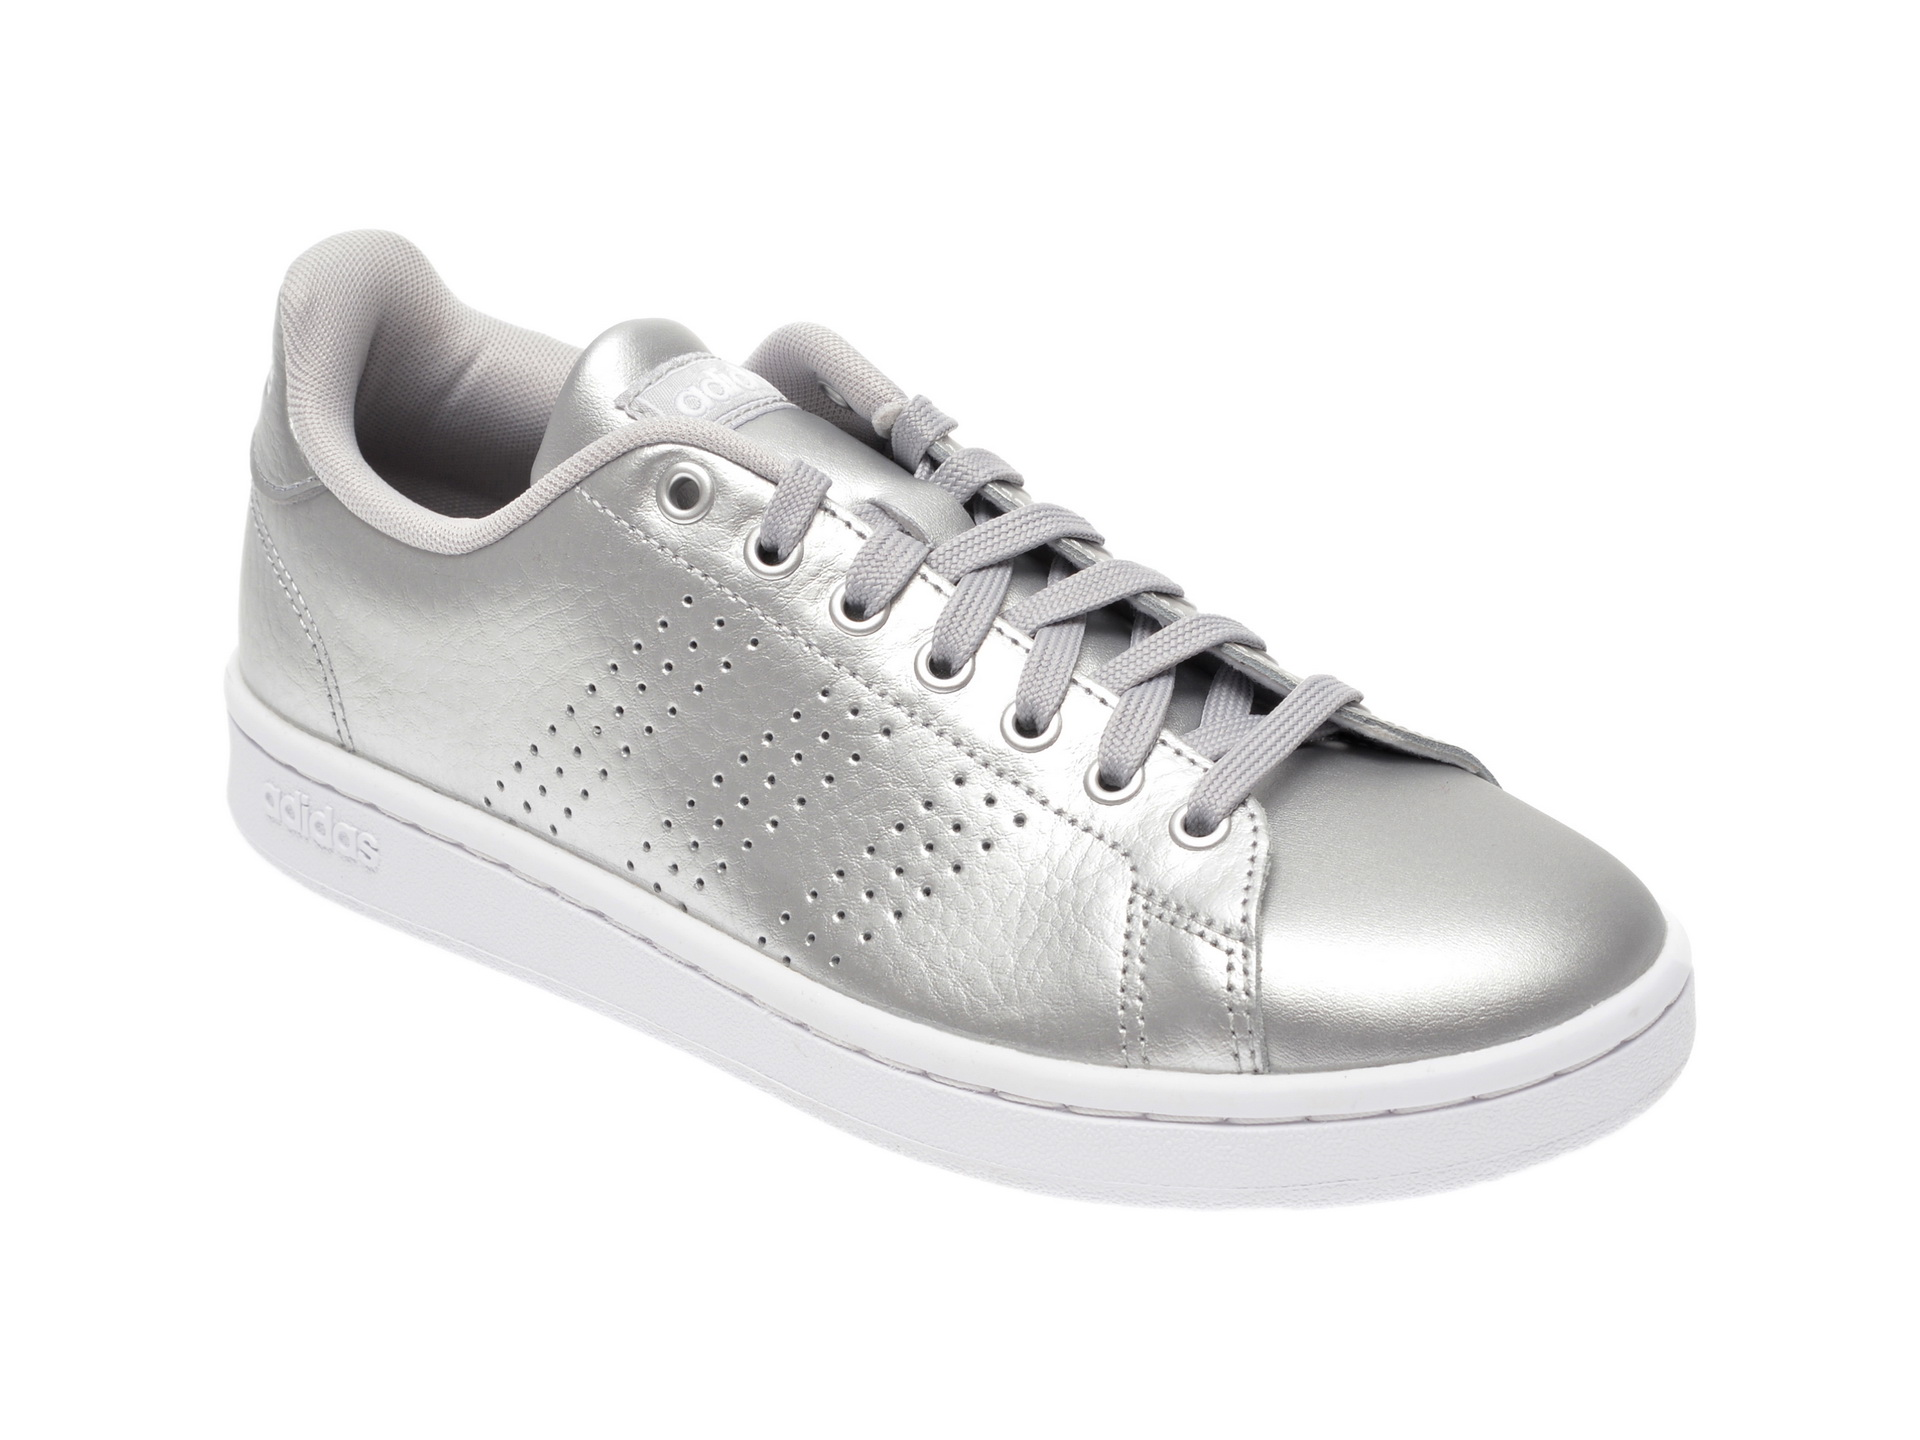 Pantofi sport ADIDAS argintii, Advantage, din piele naturala